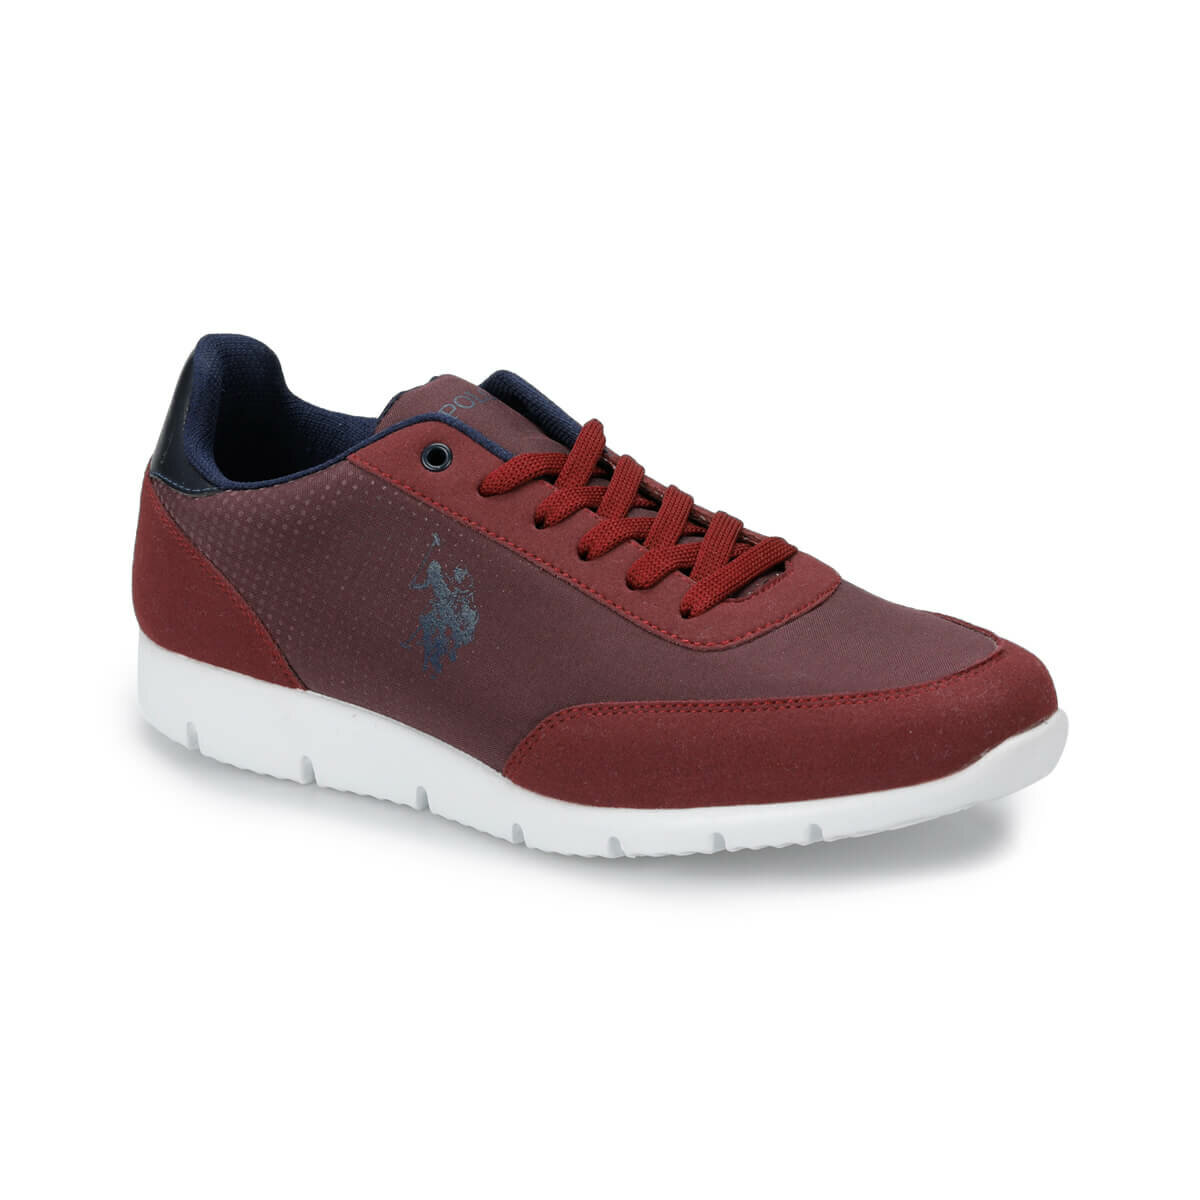 FLO BONE Burgundy Men 'S Sneaker Shoes U.S. POLO ASSN.